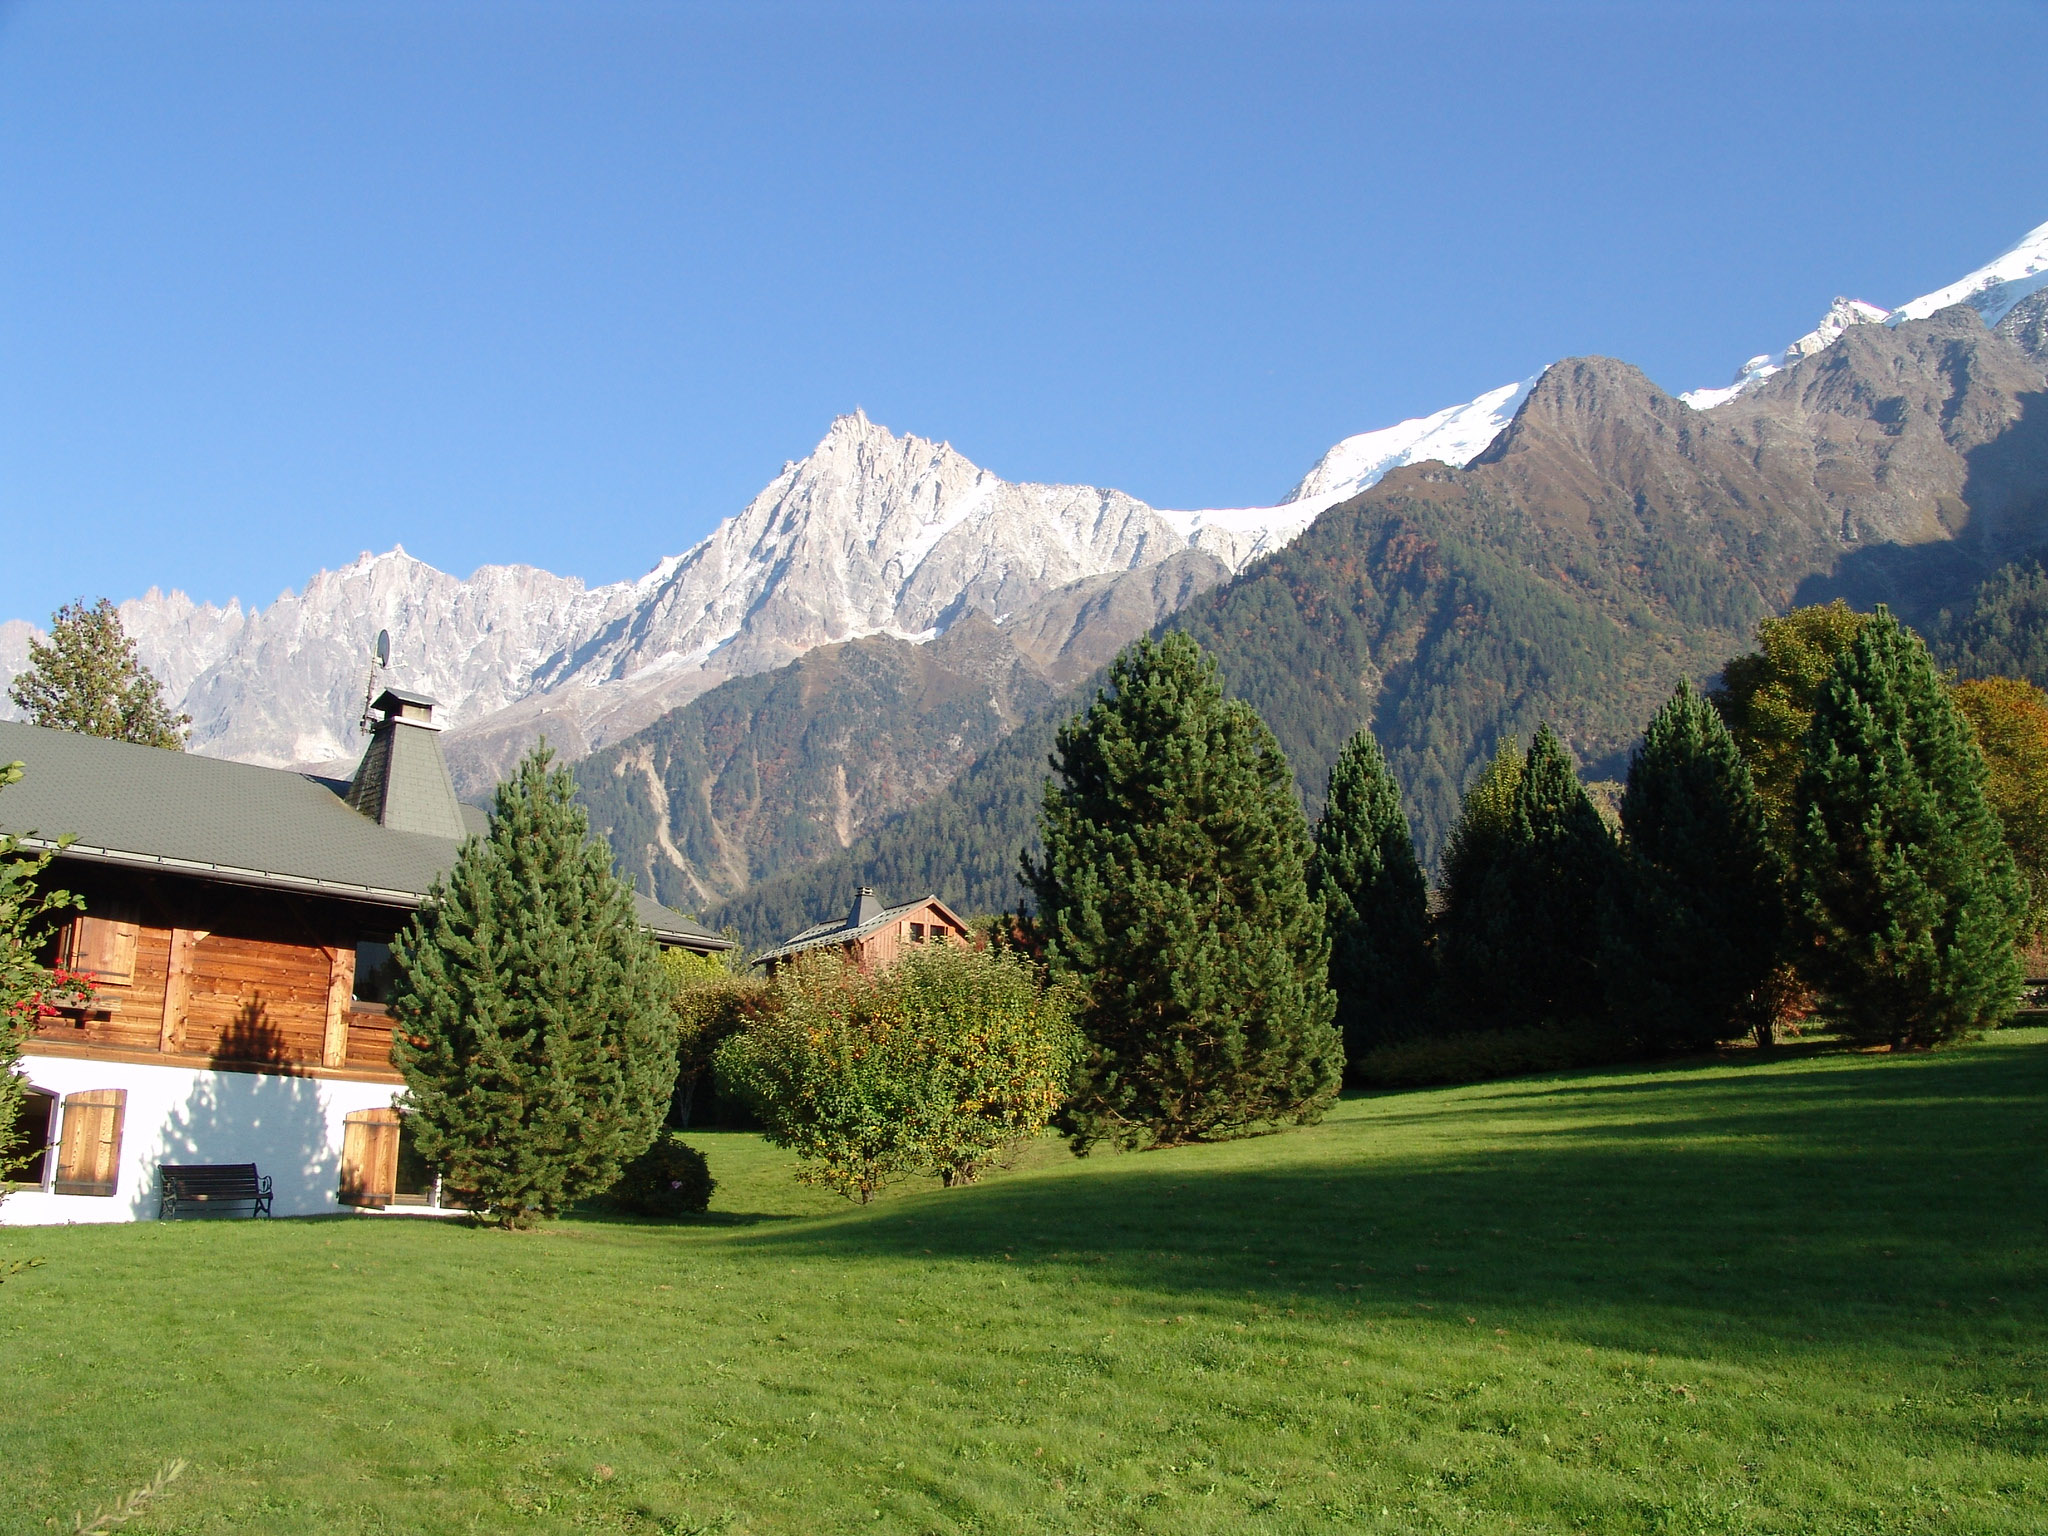 Terreno para Venda às coteaux des houches les houches Chamonix, Rhone-Alpes 74400 França